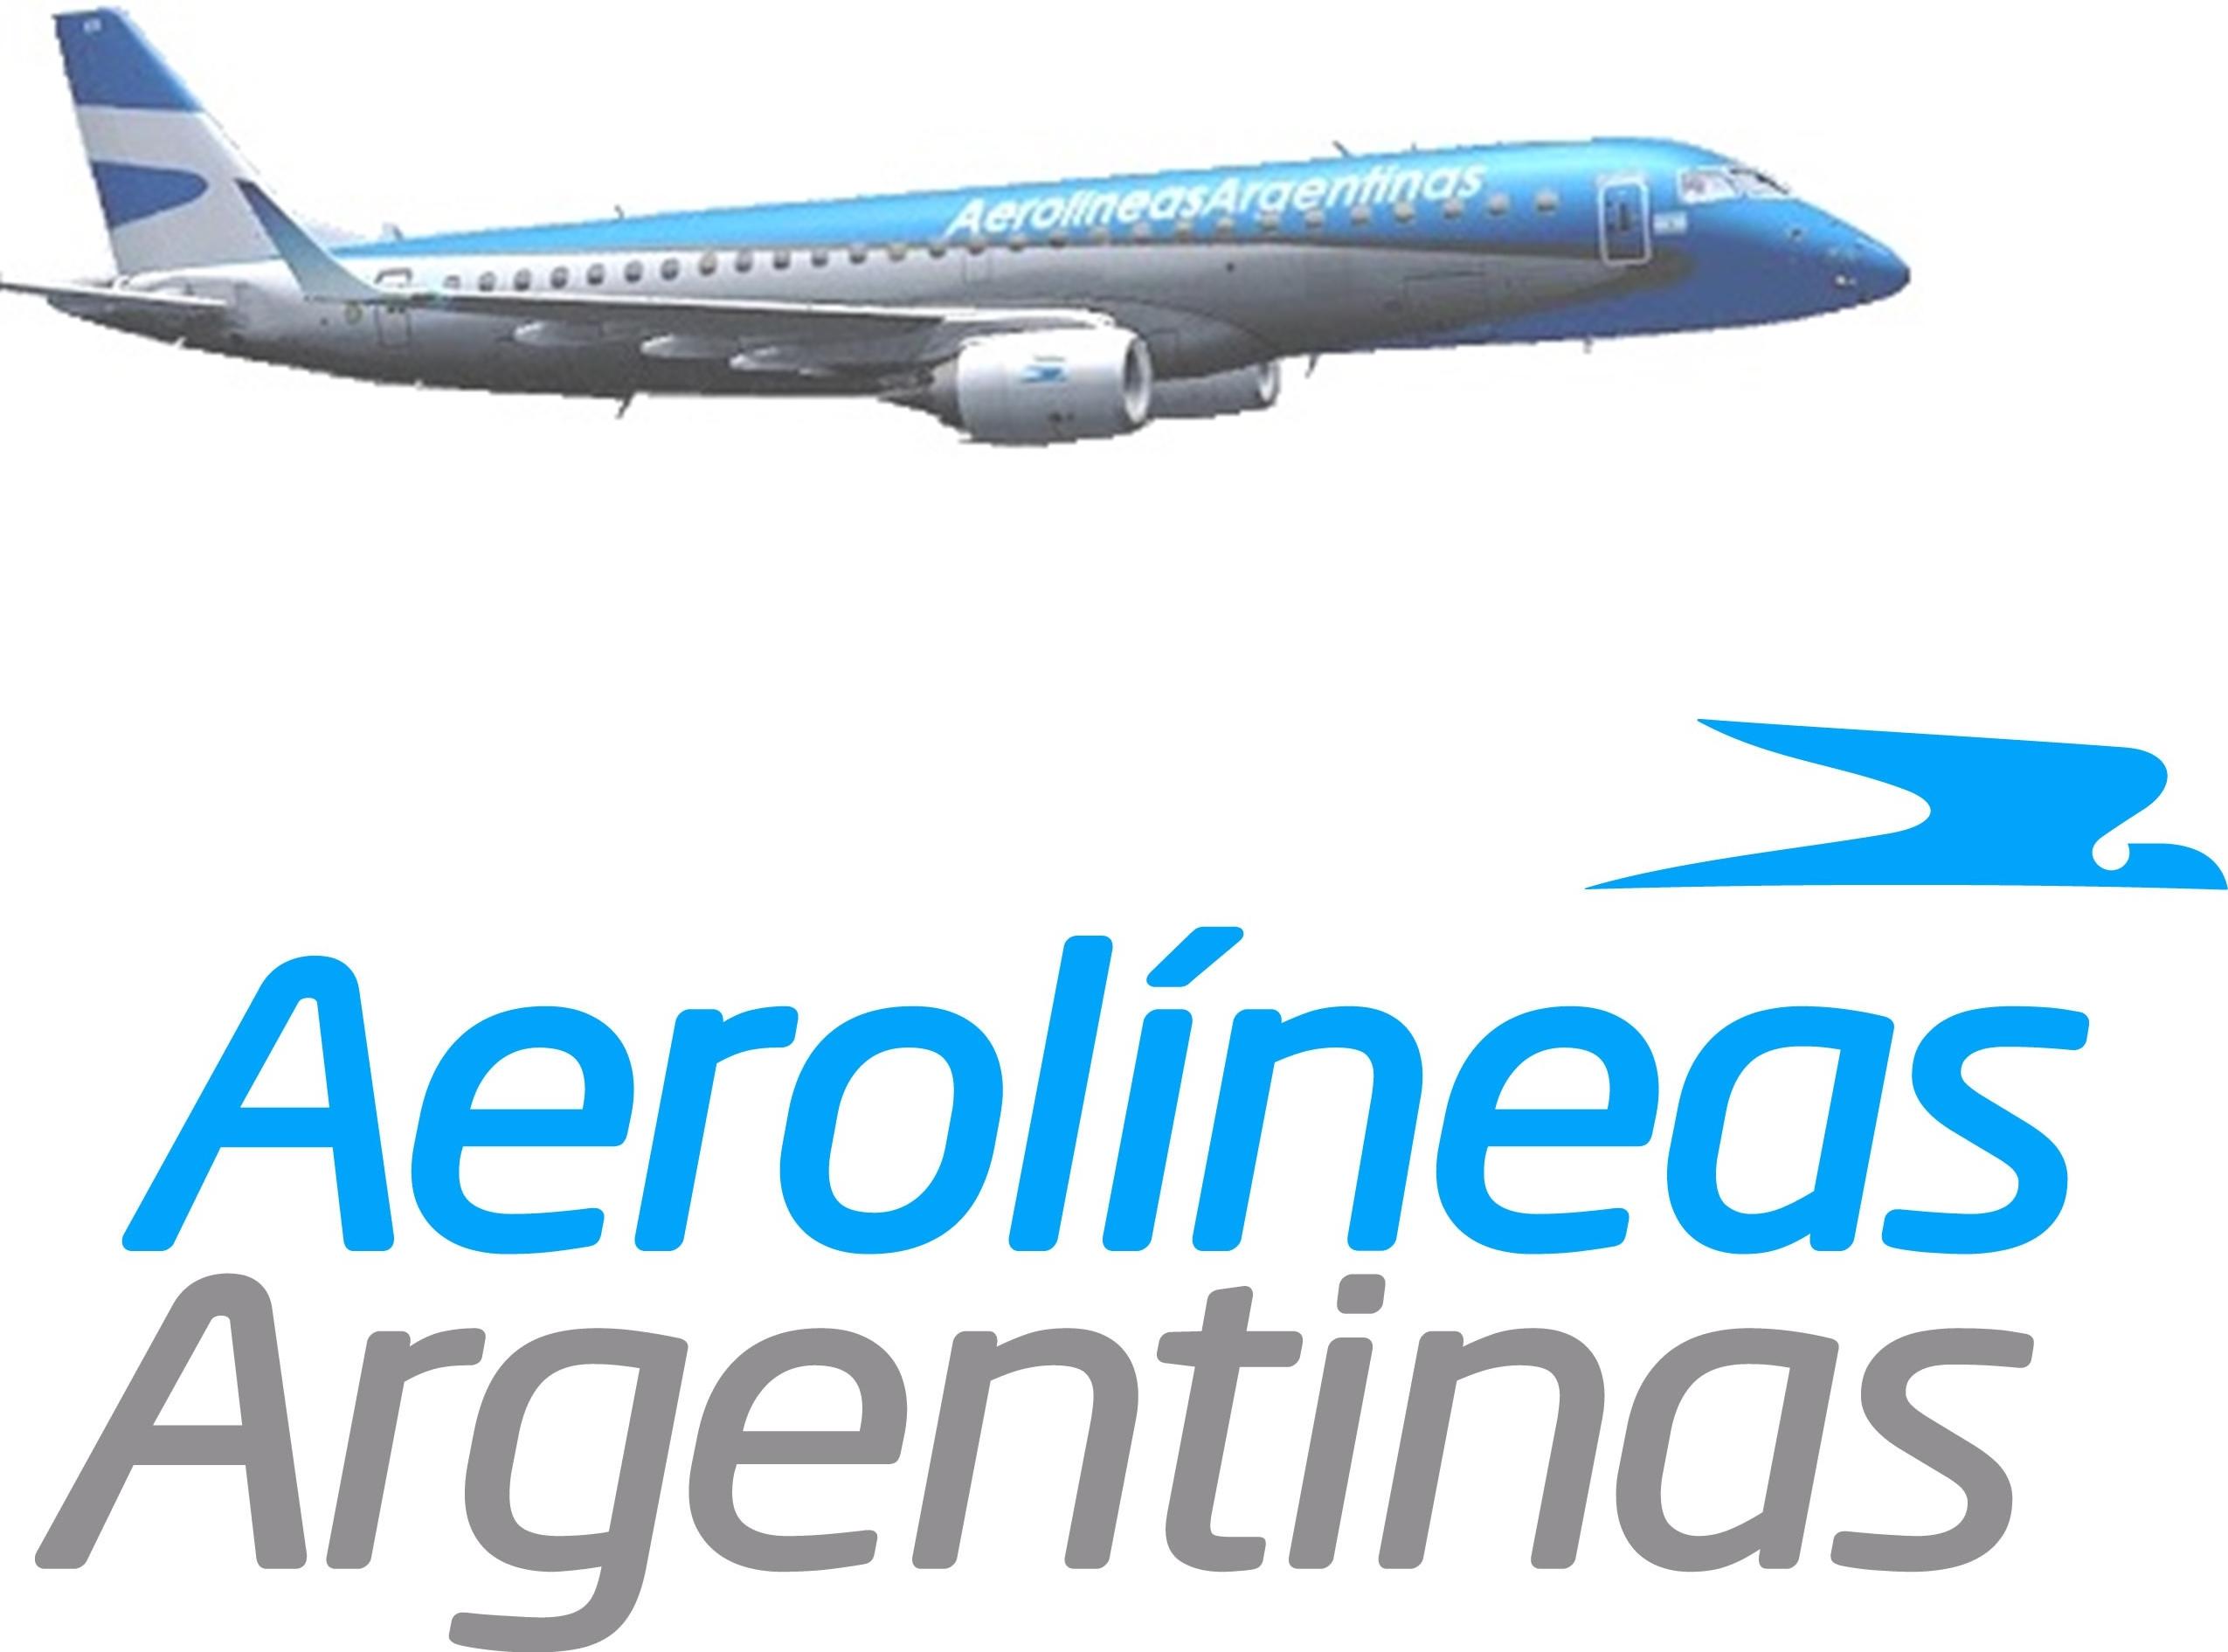 Aerolíneas Argentinas_Isologotype E190